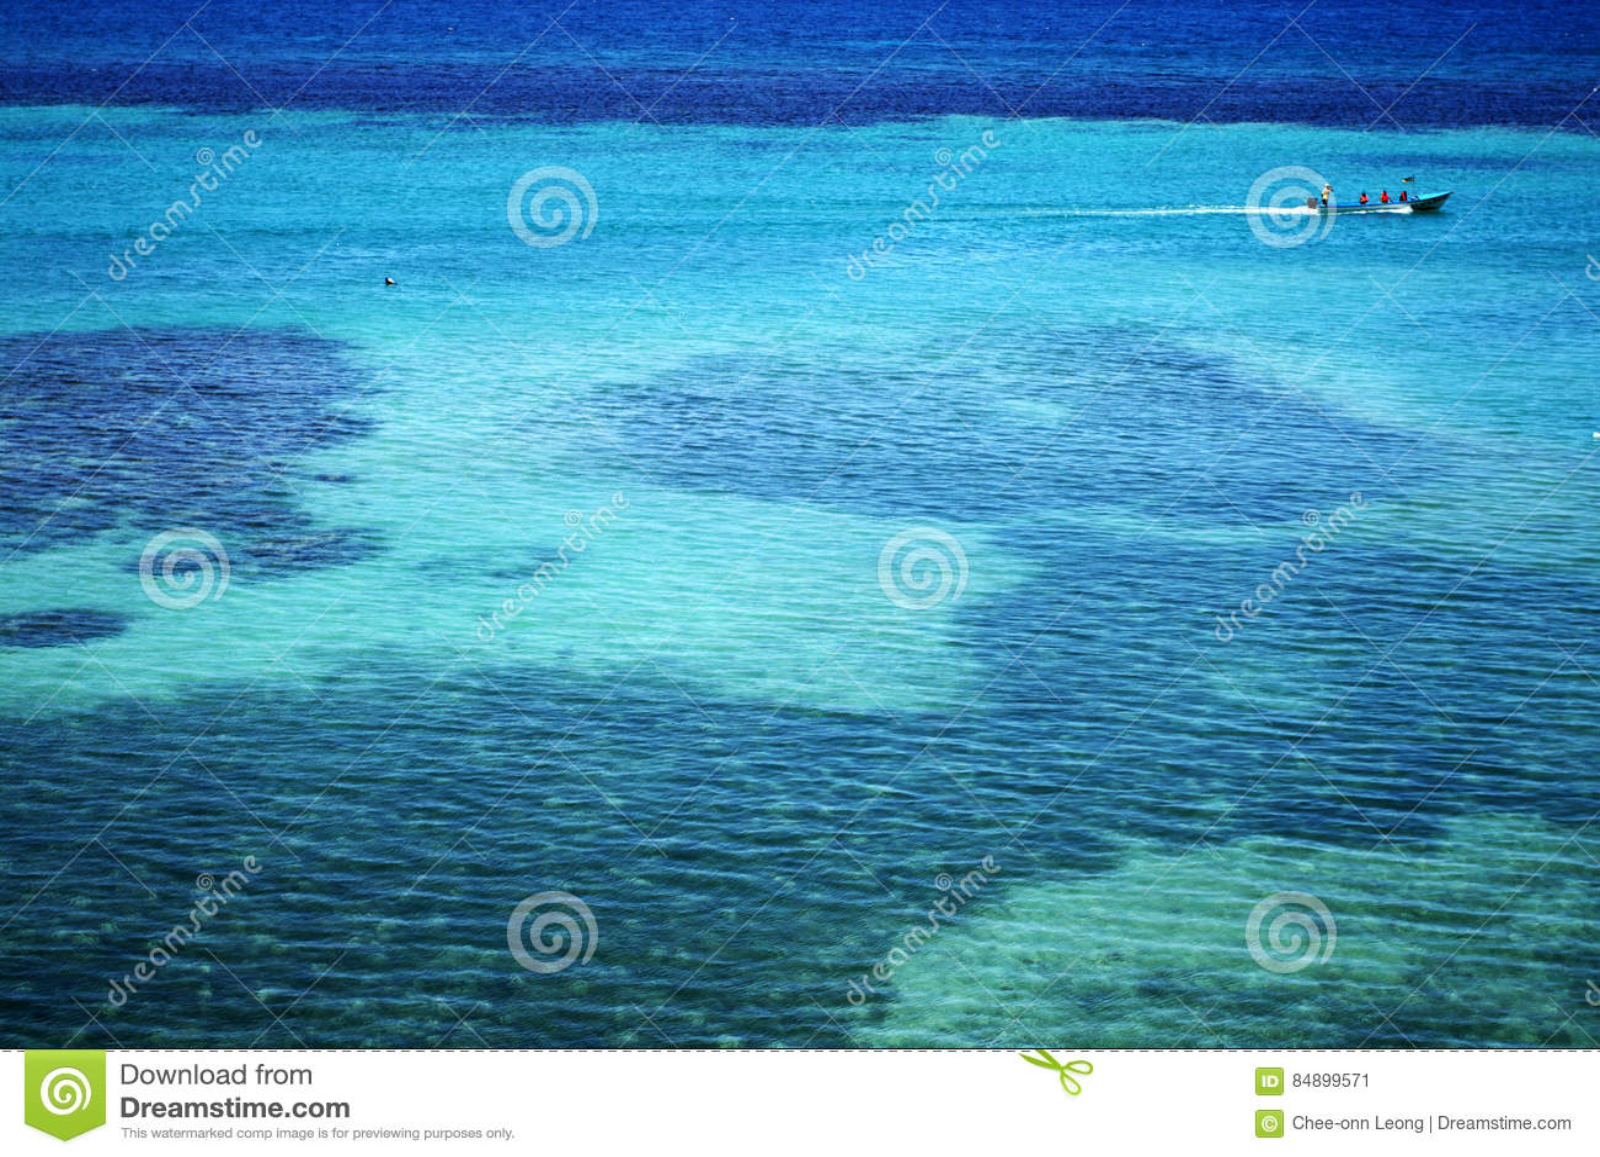 Stock image of Ocho Rios, Jamaica